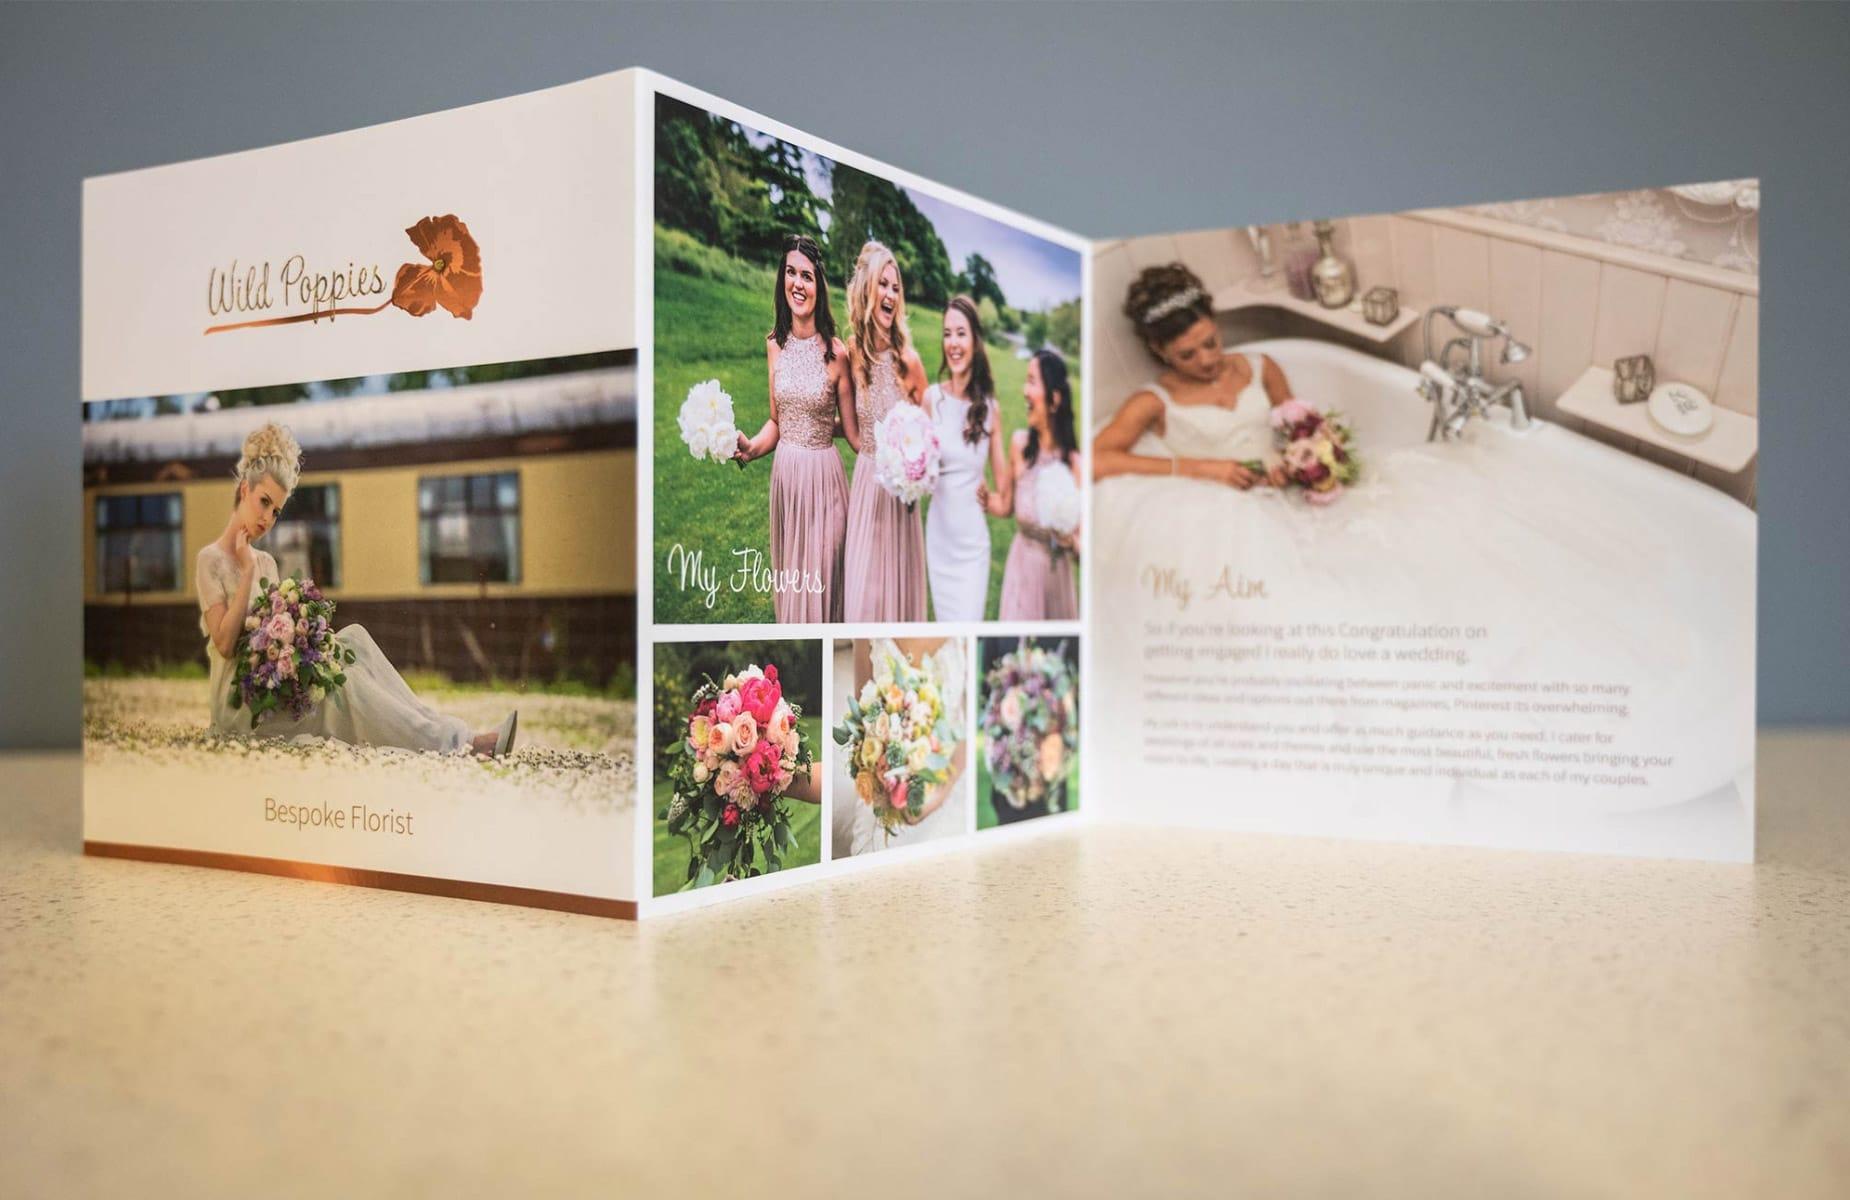 WP Creative, Design and Marketing Agency Suffolk, Print Design, Wedding Supplier, Florist Brochure